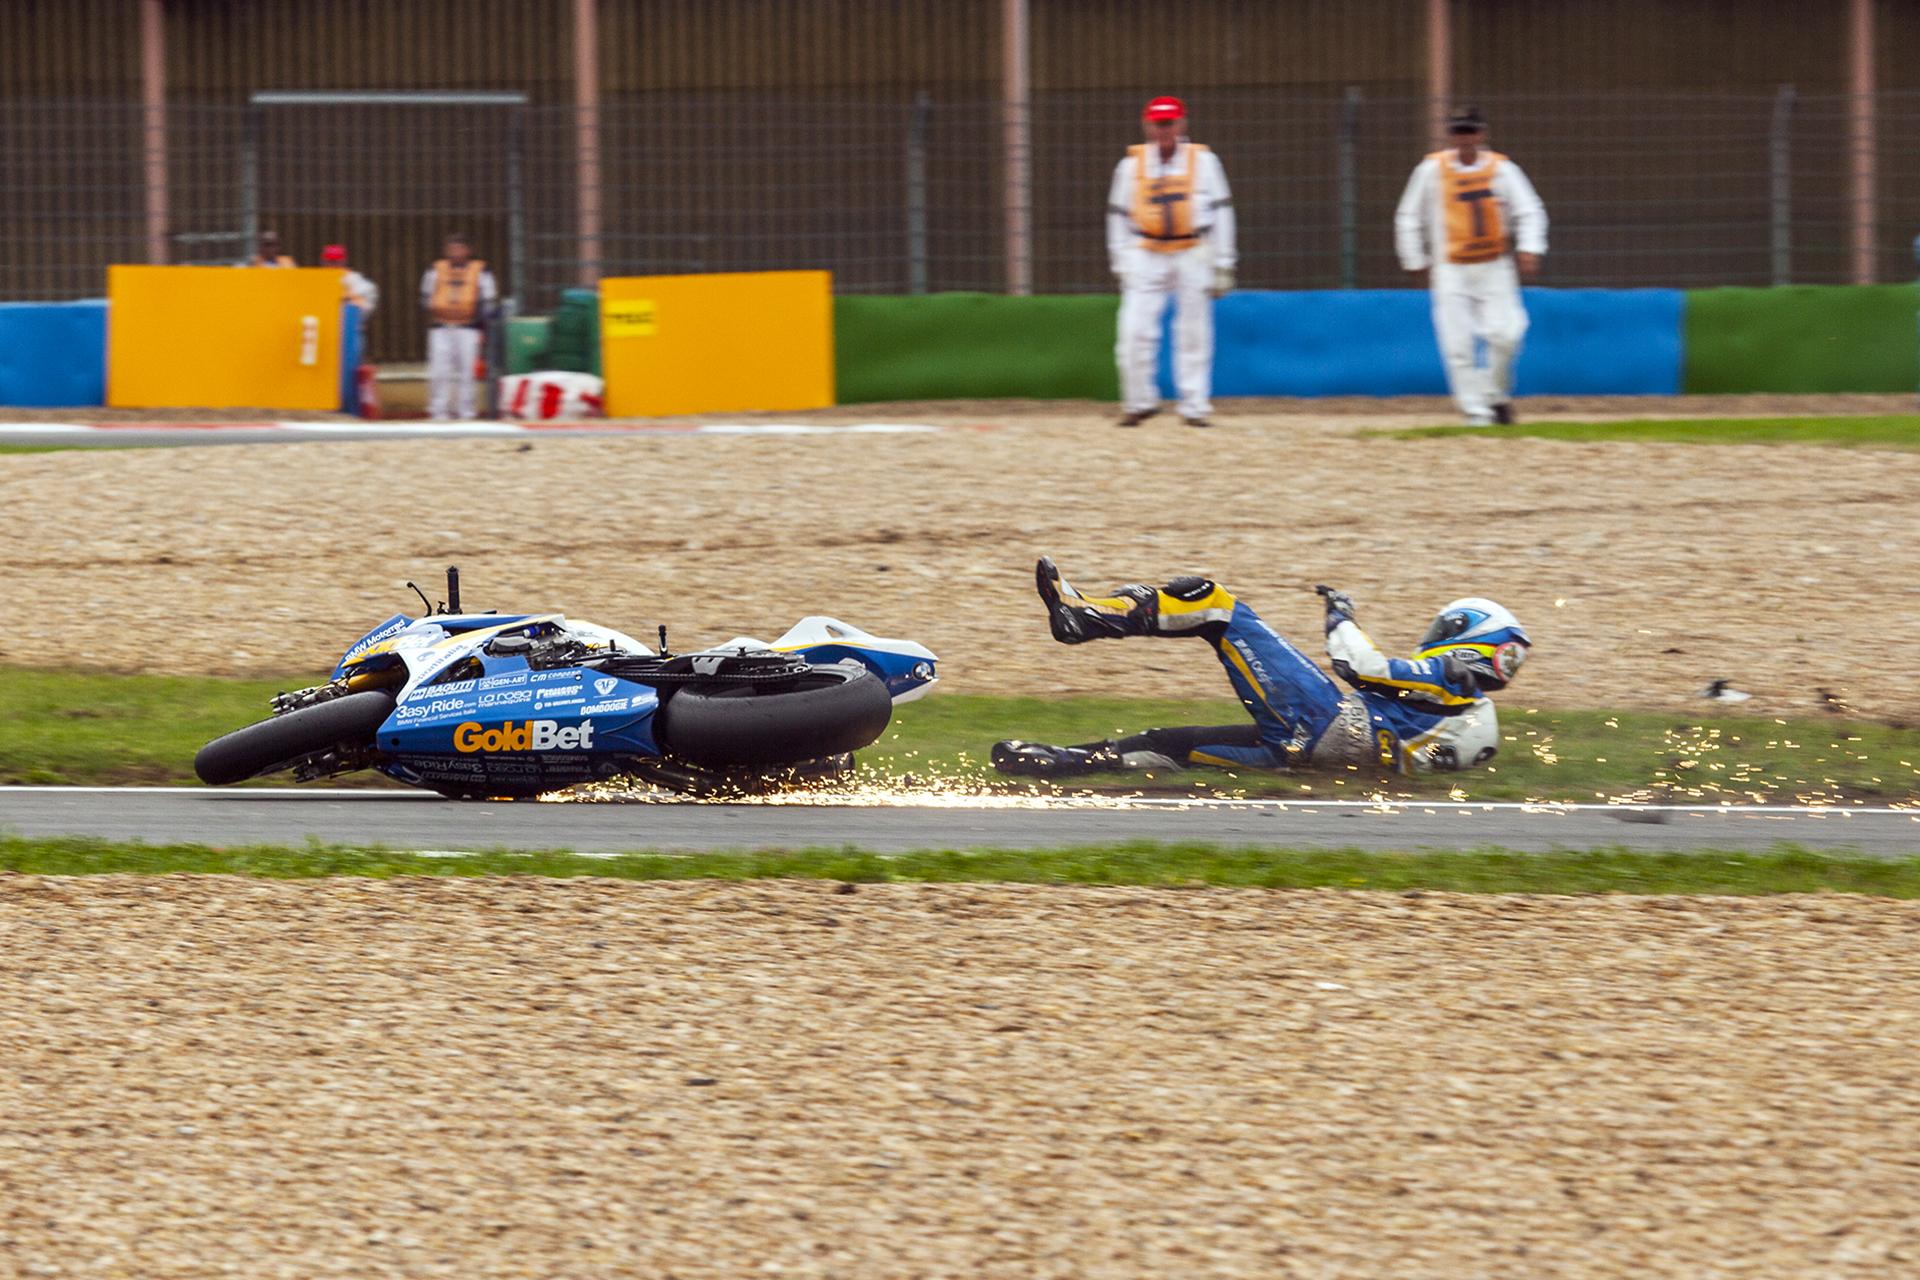 Image Michel Fabrizio Superbike World Championship